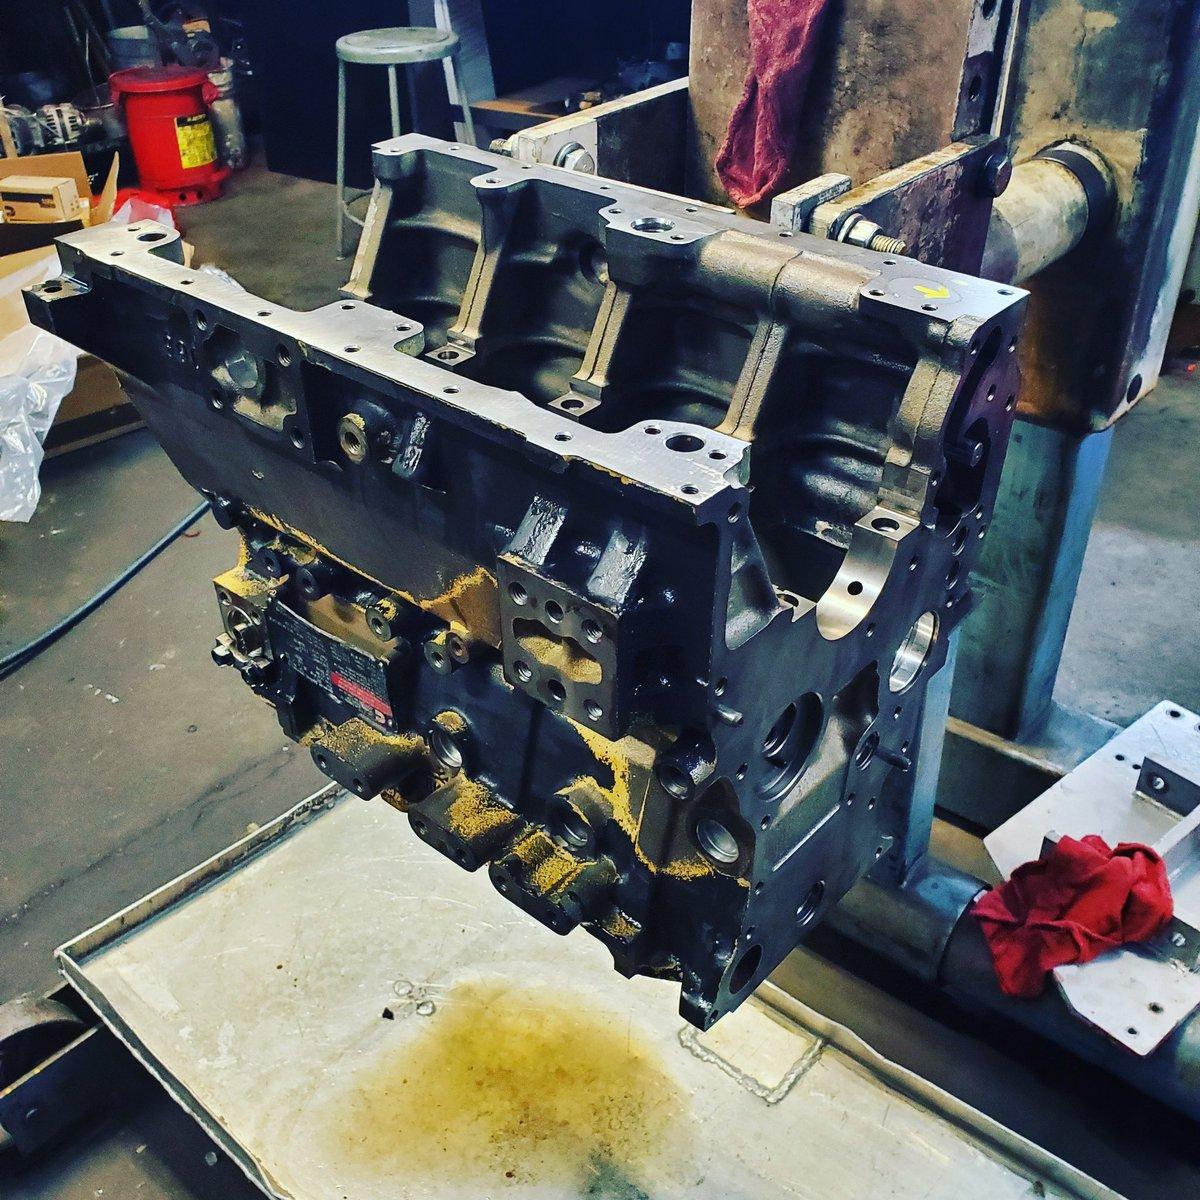 Little Cummns 4B on the stand today. ... #diesel #engines #diesellife #AFS #atlanta #atlantadiesel #cummins #cumminsdealer #dieselenginespic.twitter.com/bm0KgNGK5q